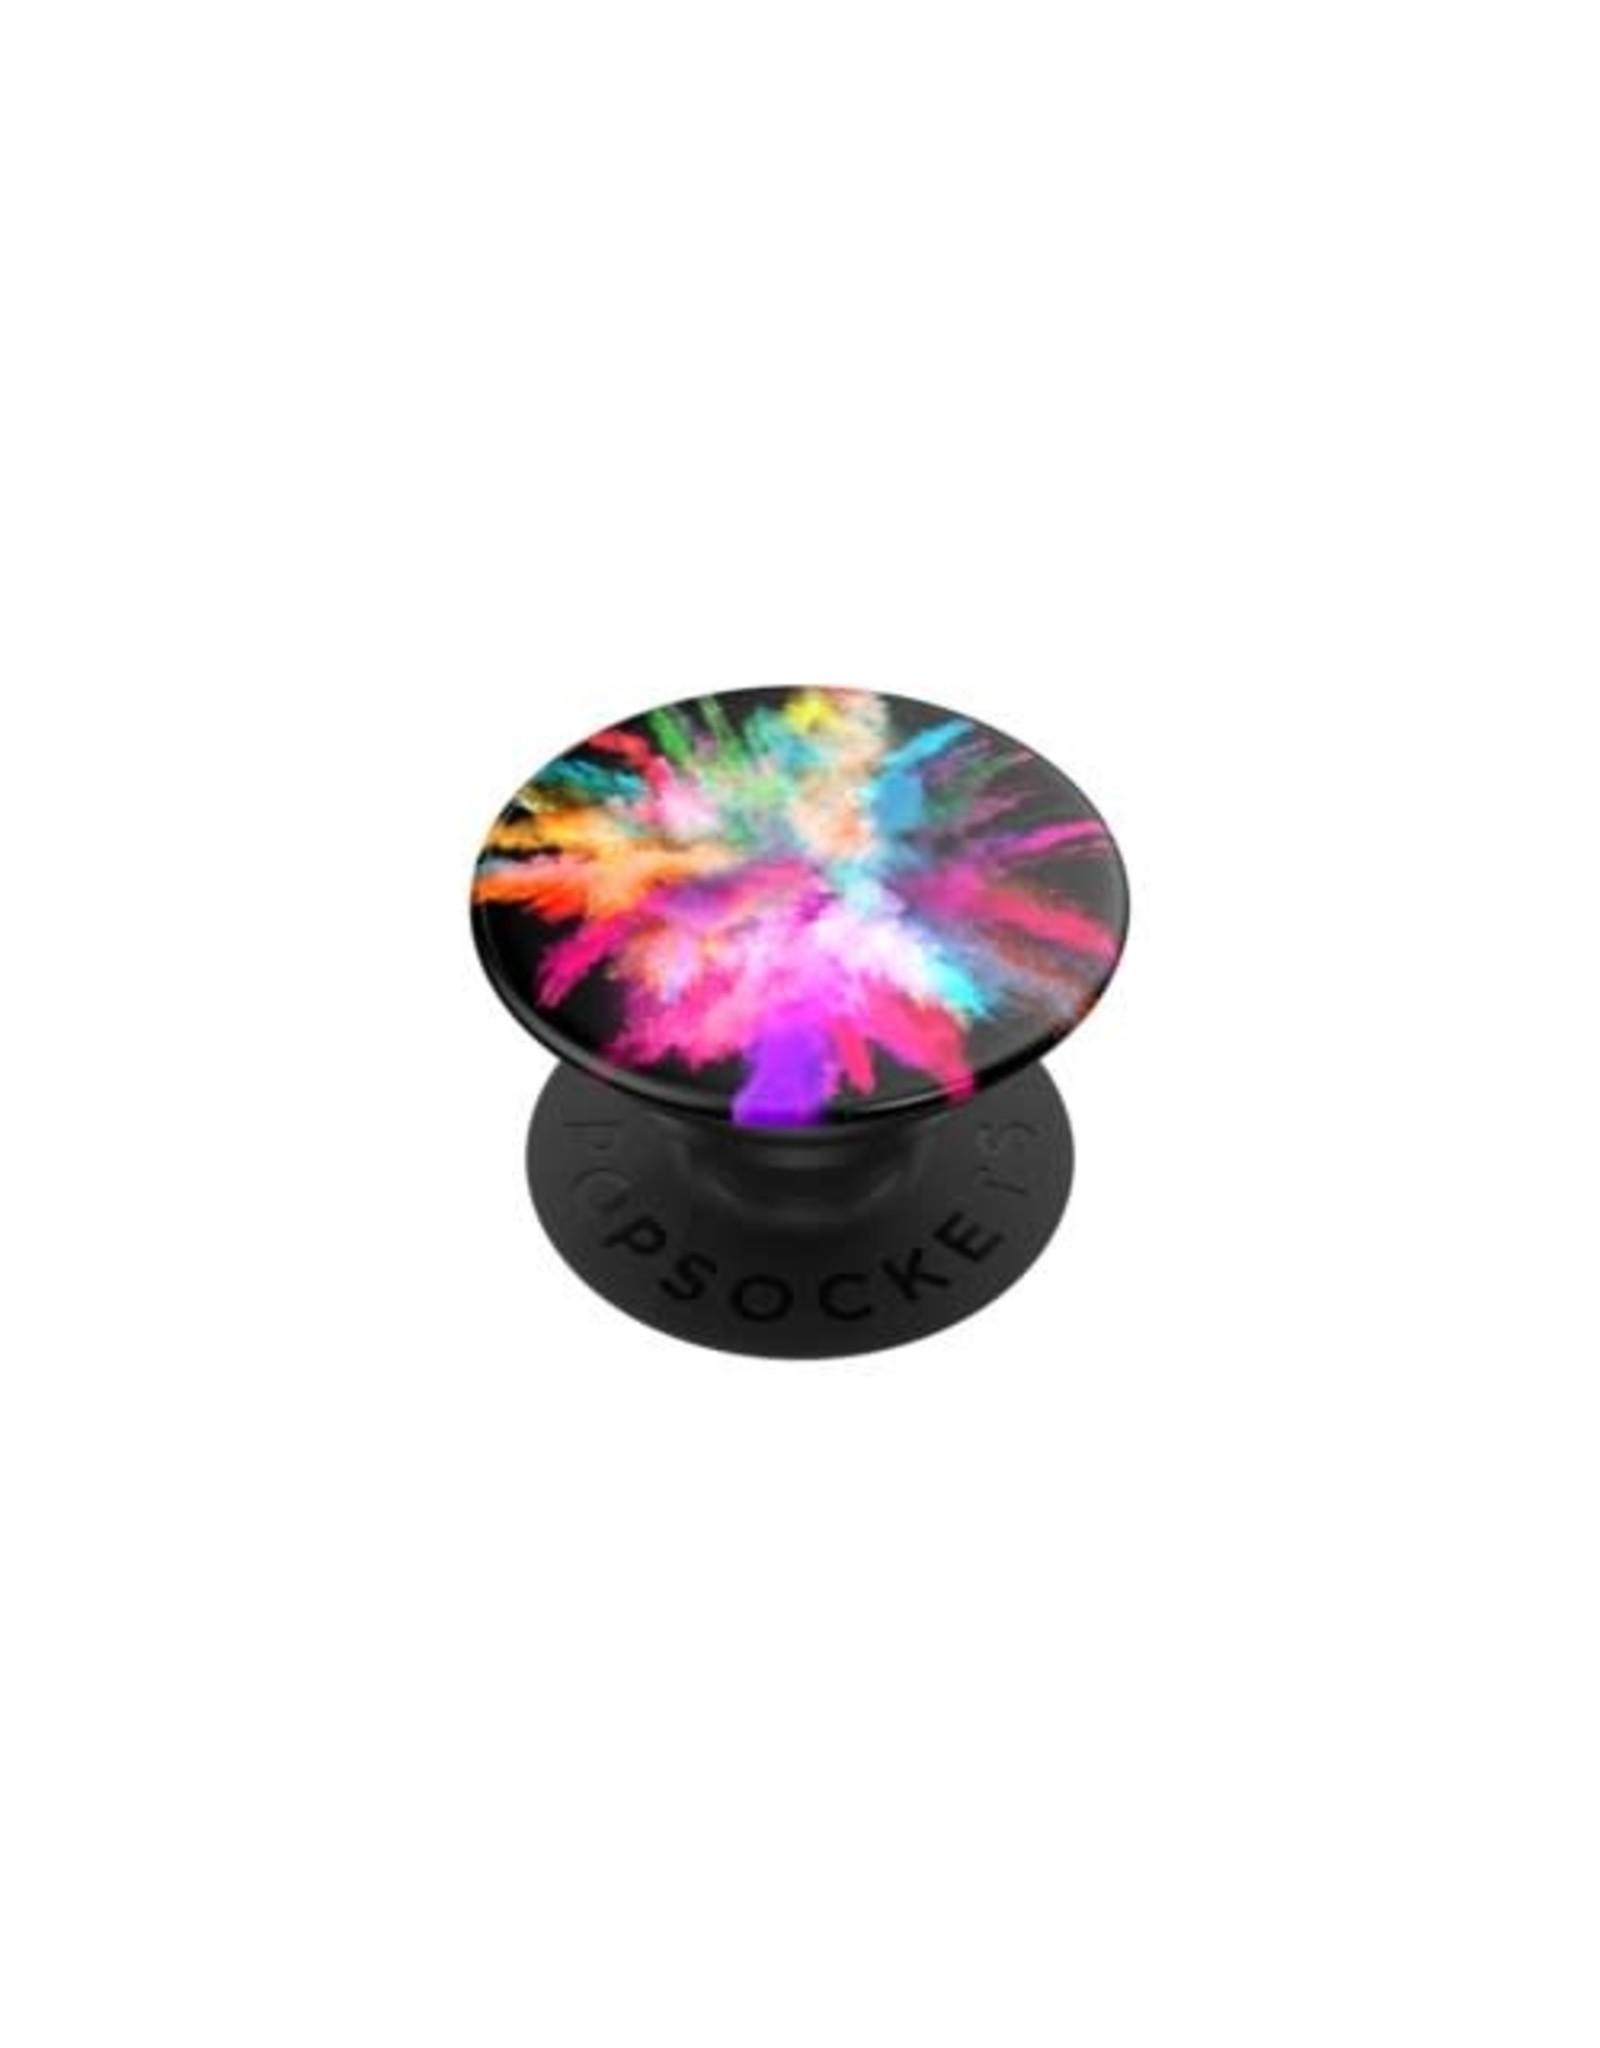 PopSockets PopSocket PopGrip Universal Grip Holder - Colour Burst Gloss